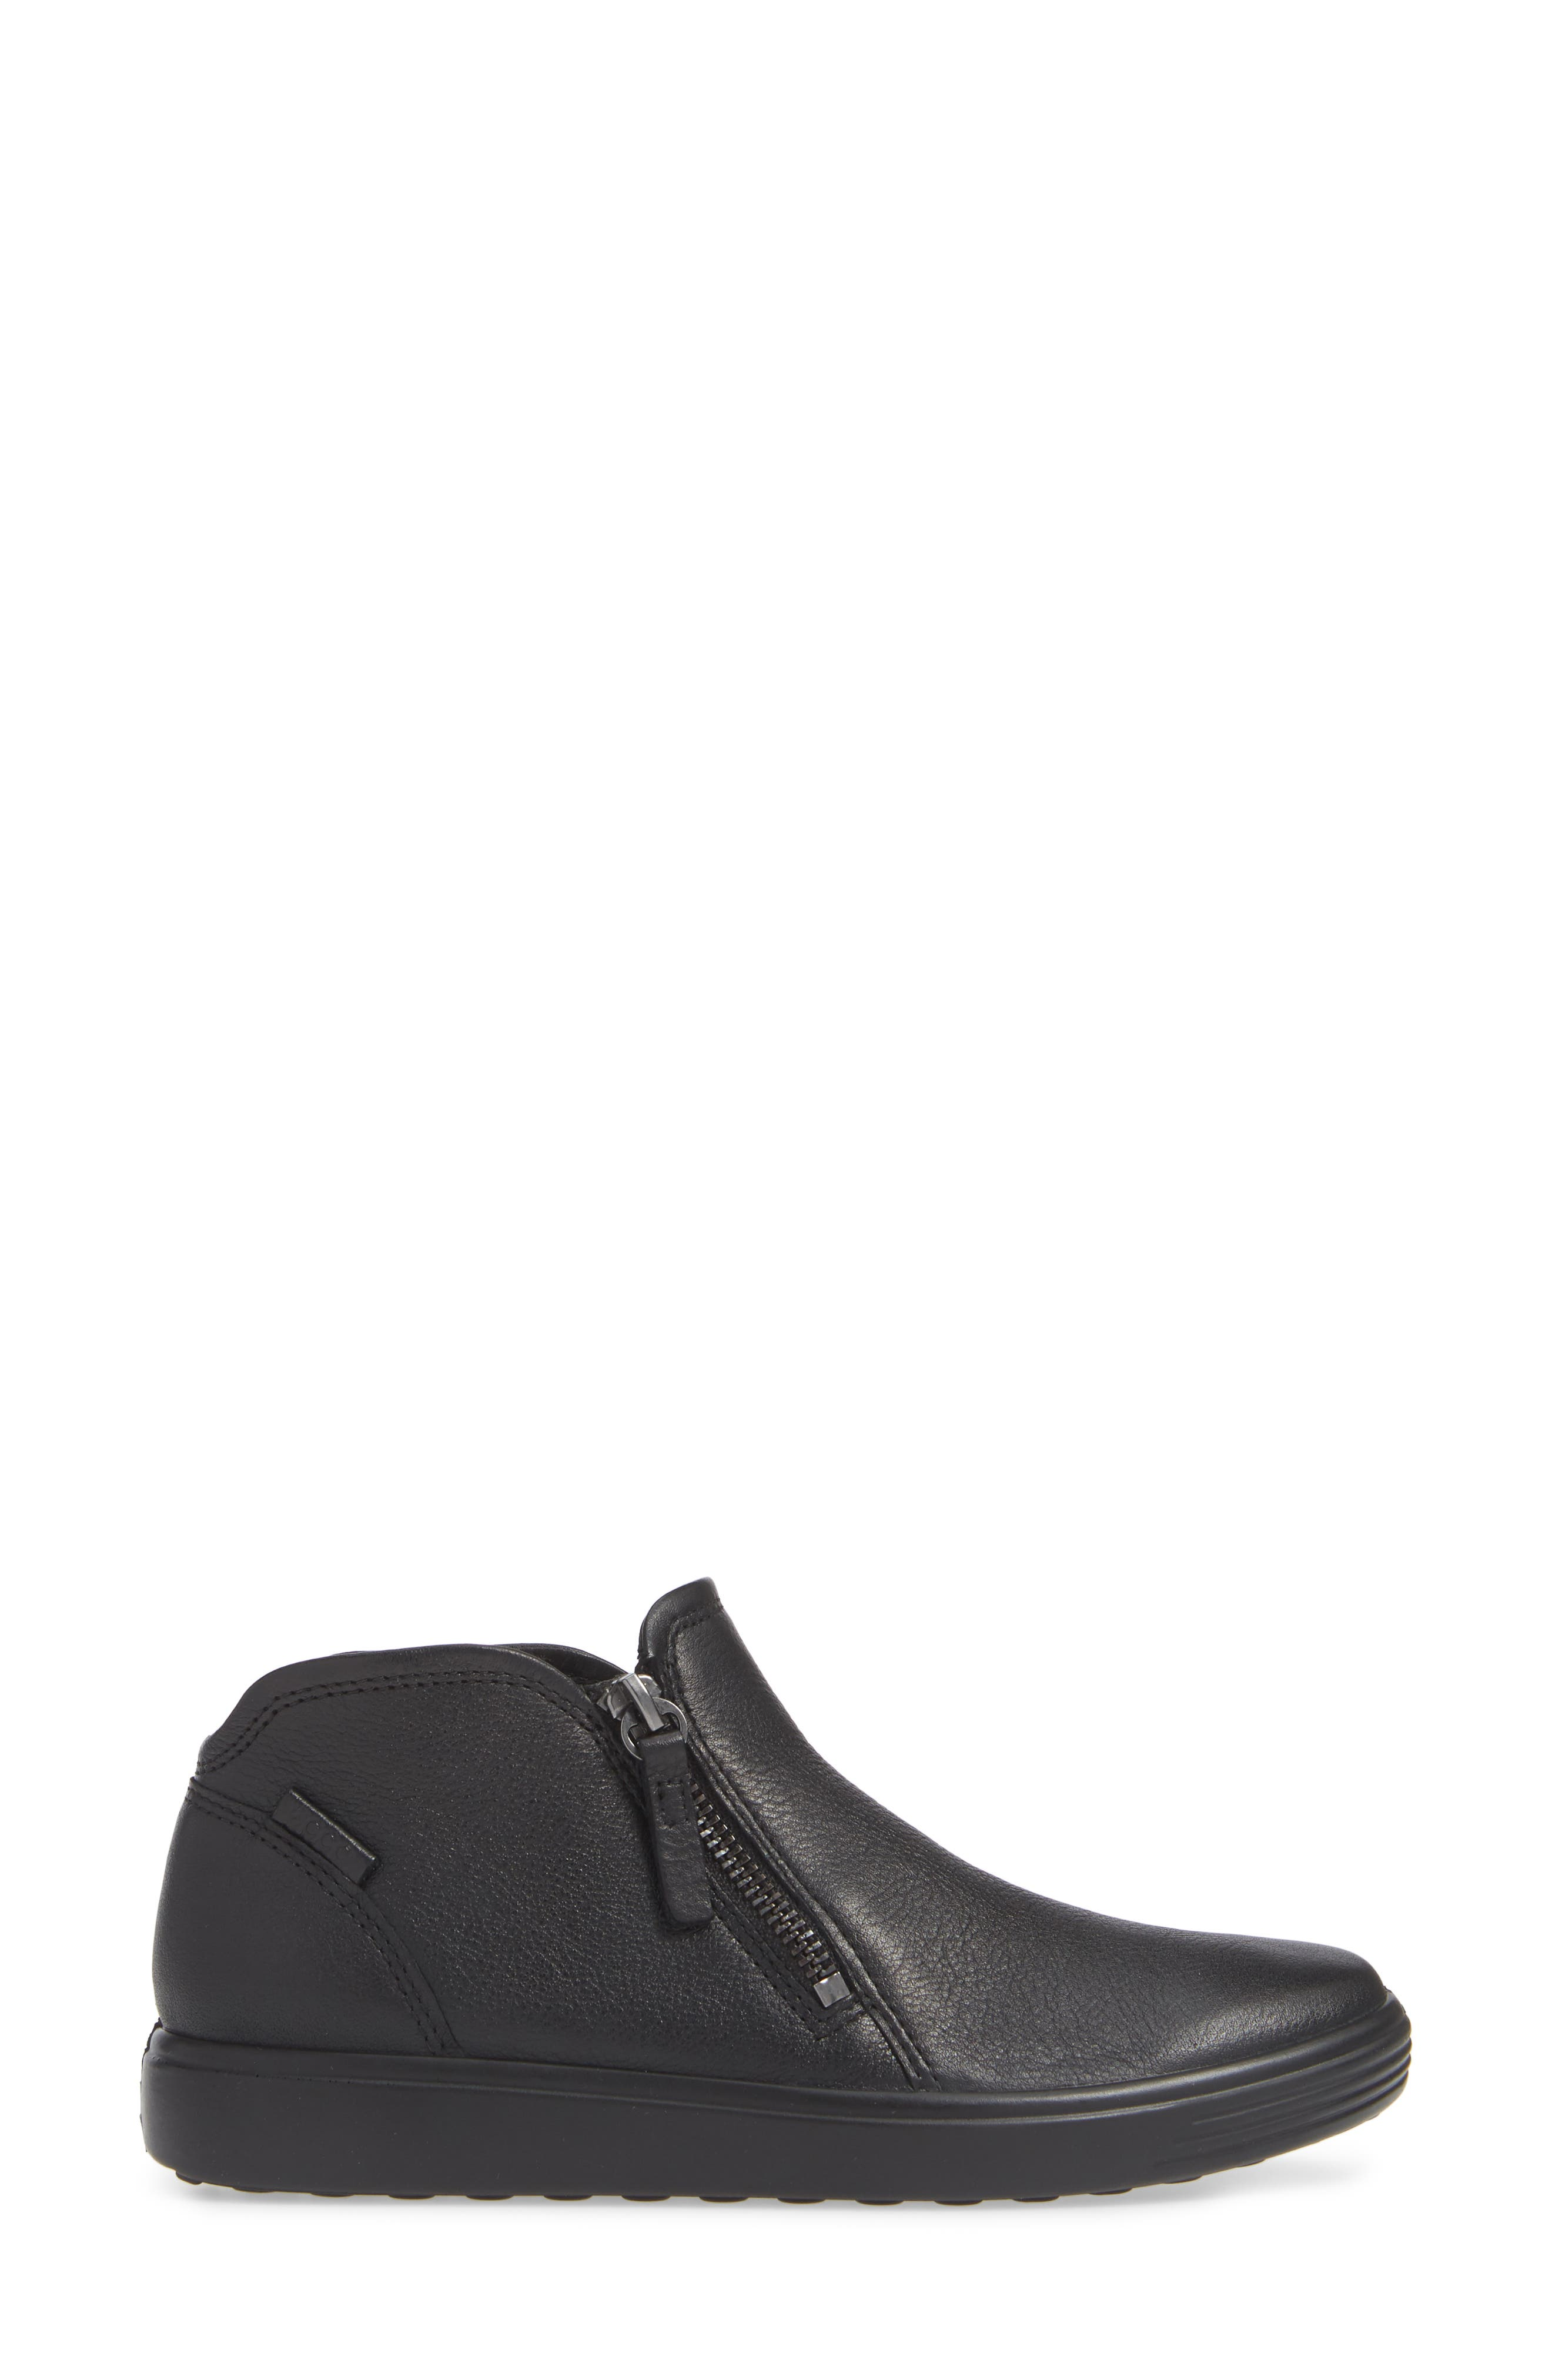 ECCO, Soft 7 Mid Top Sneaker, Alternate thumbnail 3, color, BLACK/ BLACK LEATHER